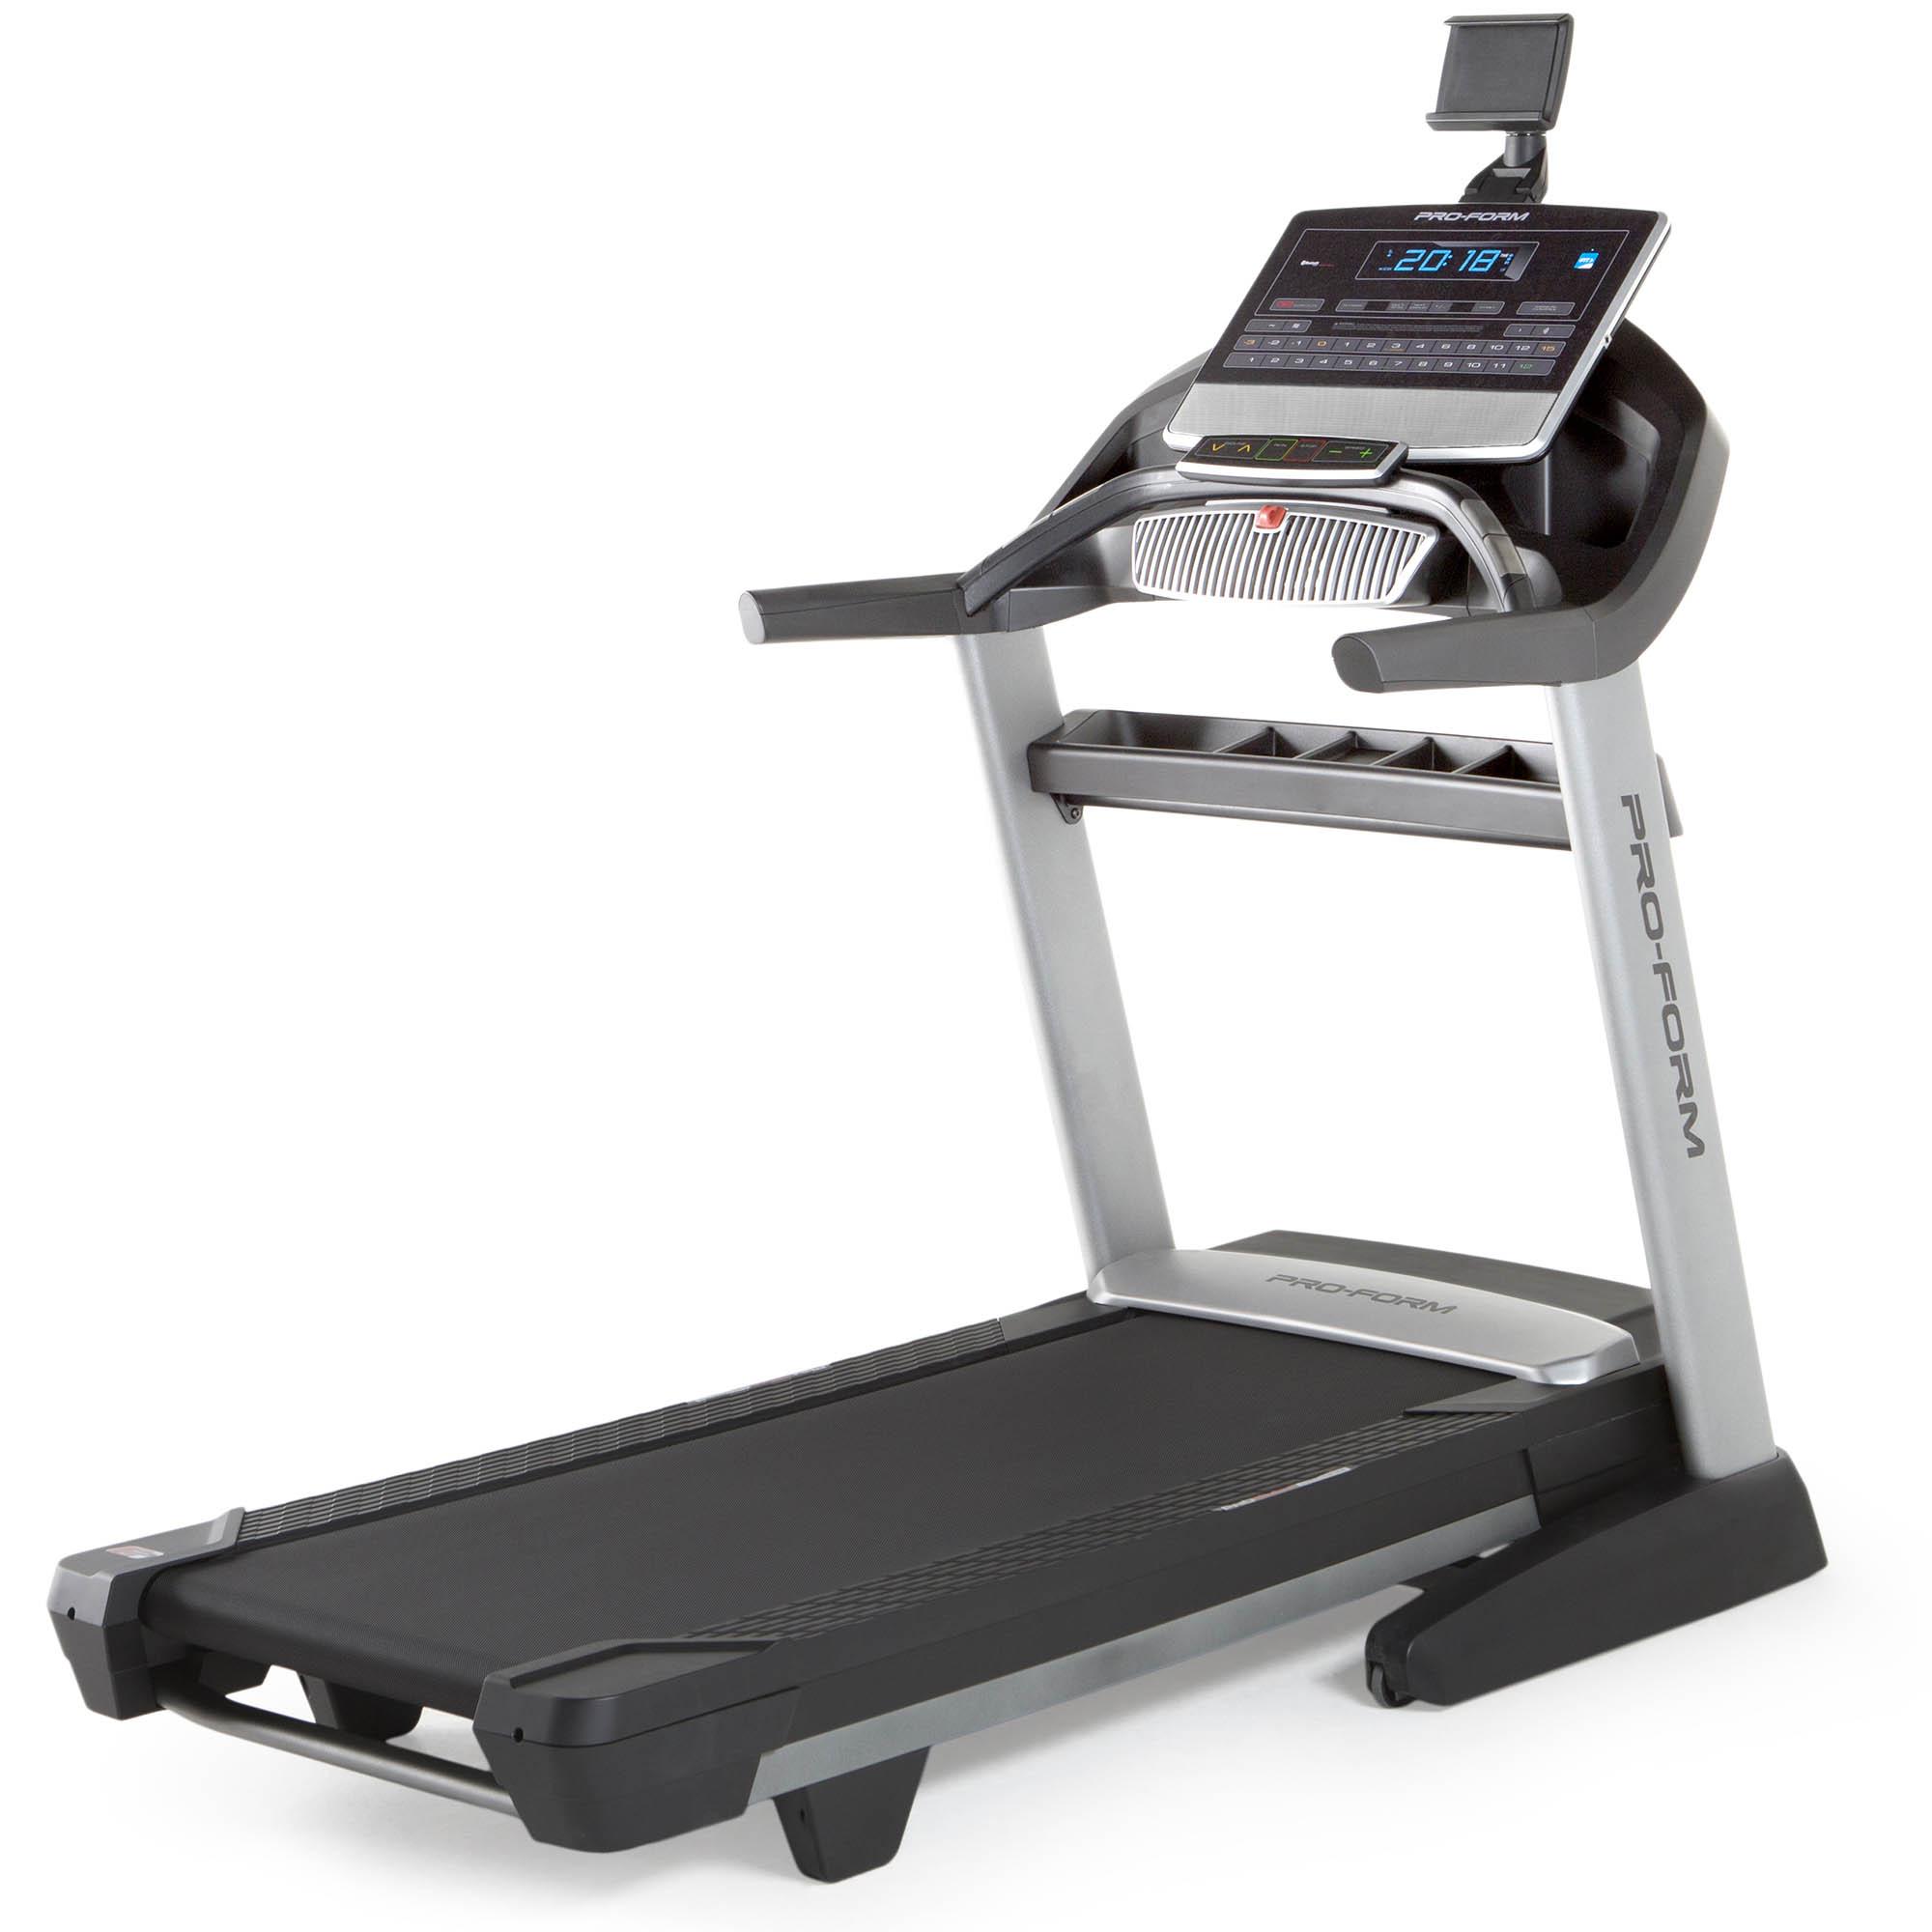 ProForm Pro 1500 Treadmill